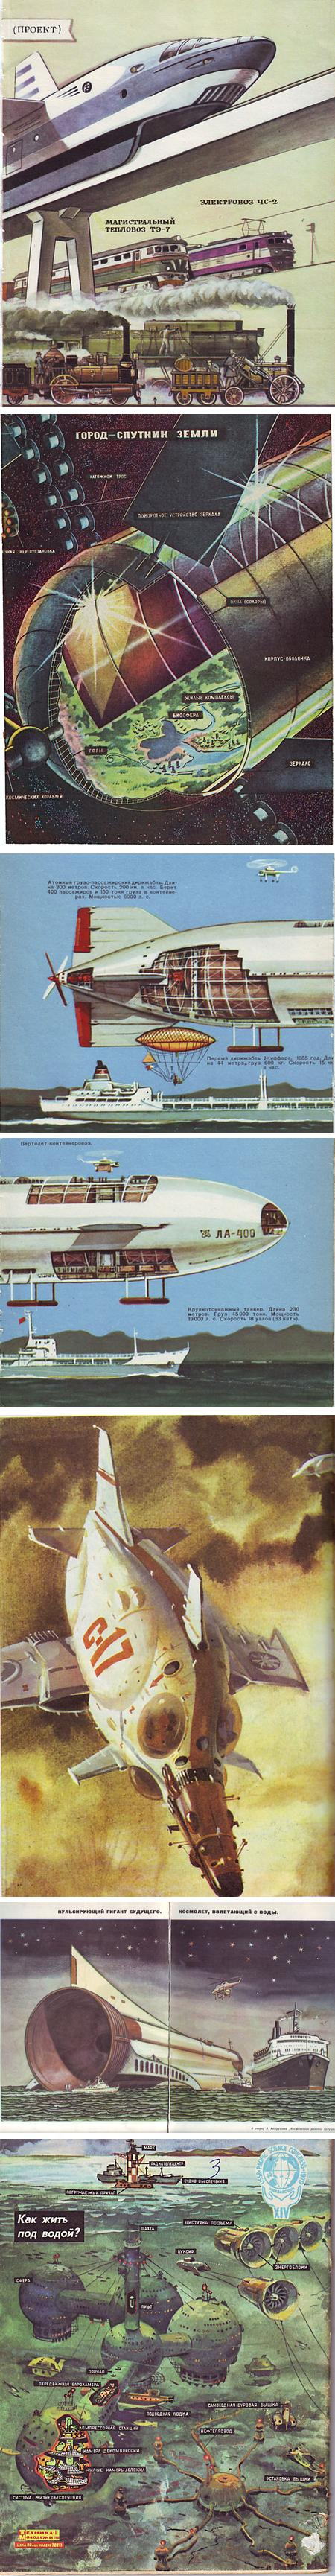 Russian vintage science illustration blog